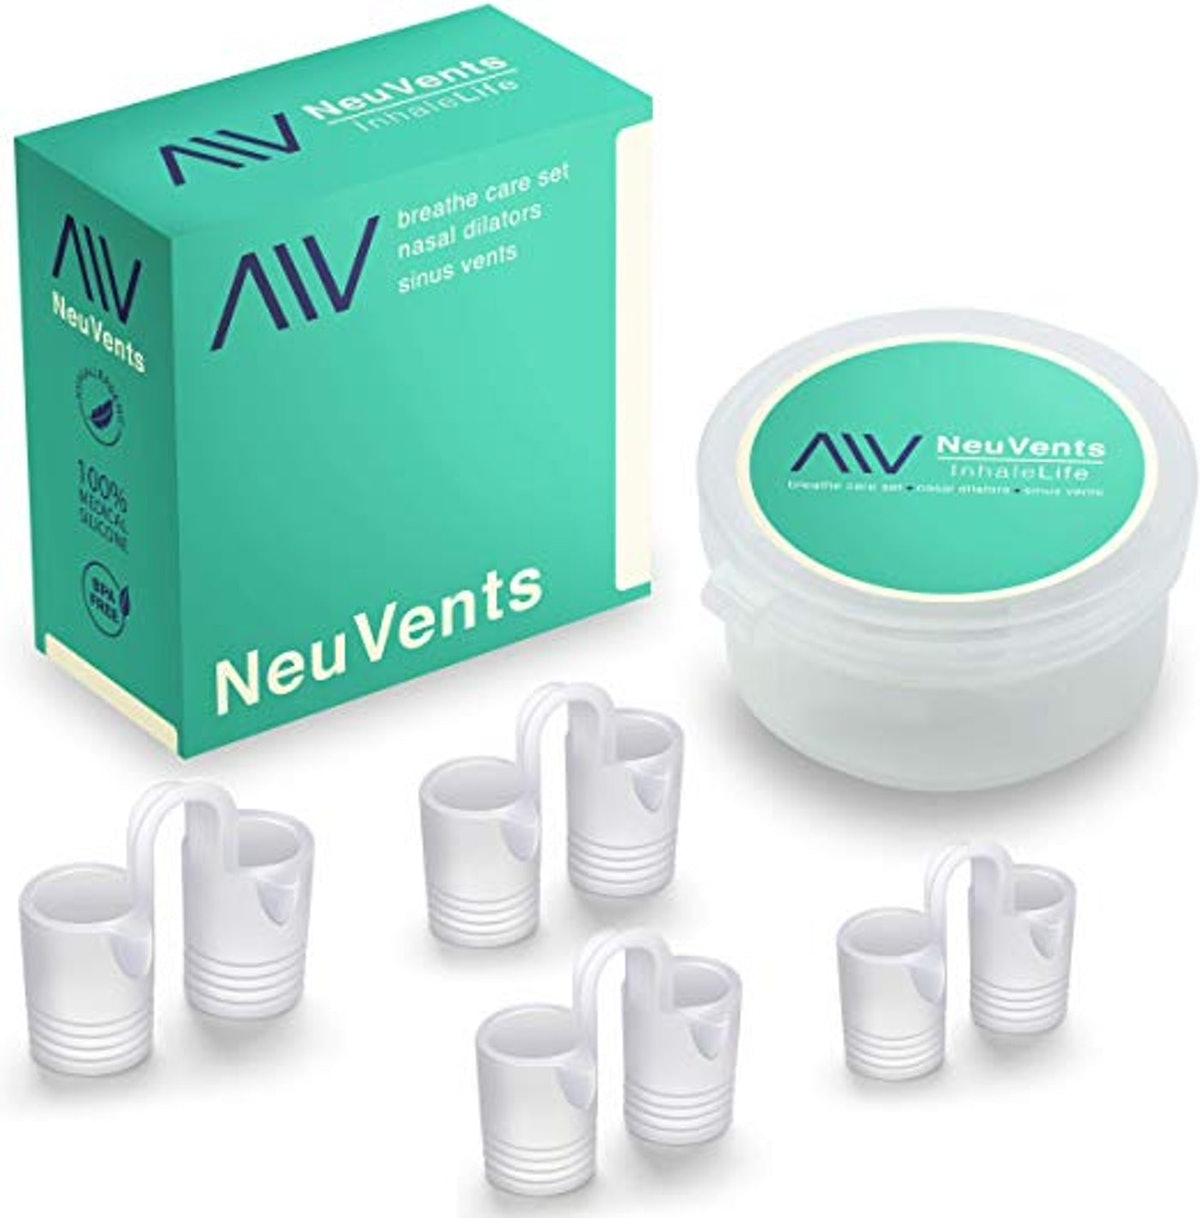 NeuVents Anti Snoring Nasal Dilator